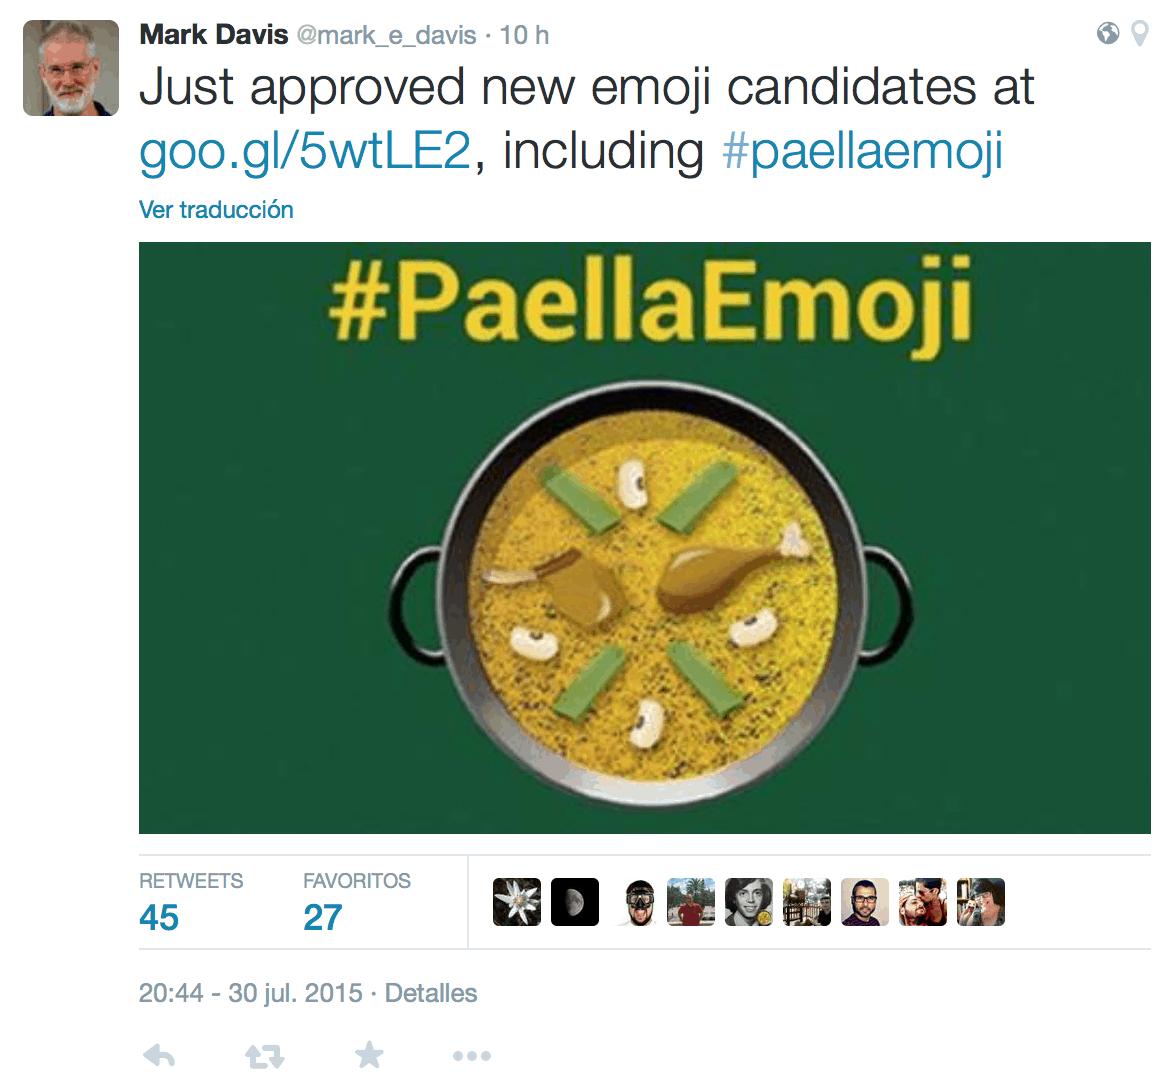 paella valenciana candidata emoji